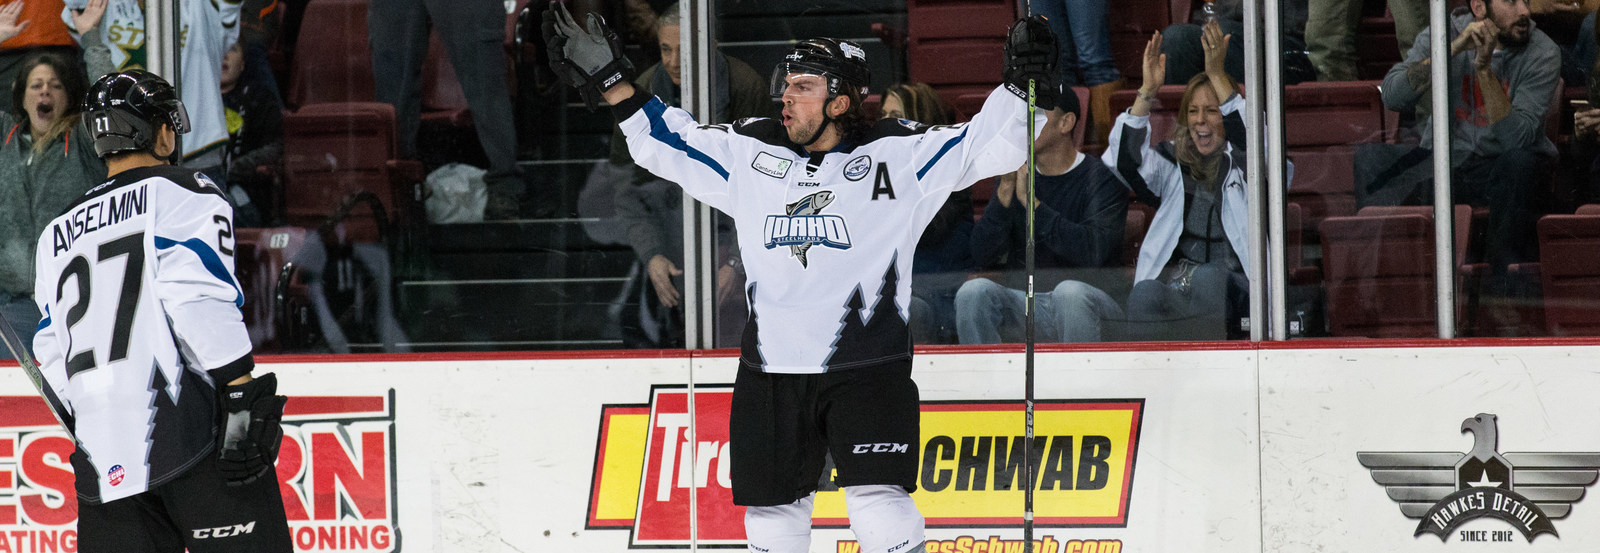 a hockey player raising their hands